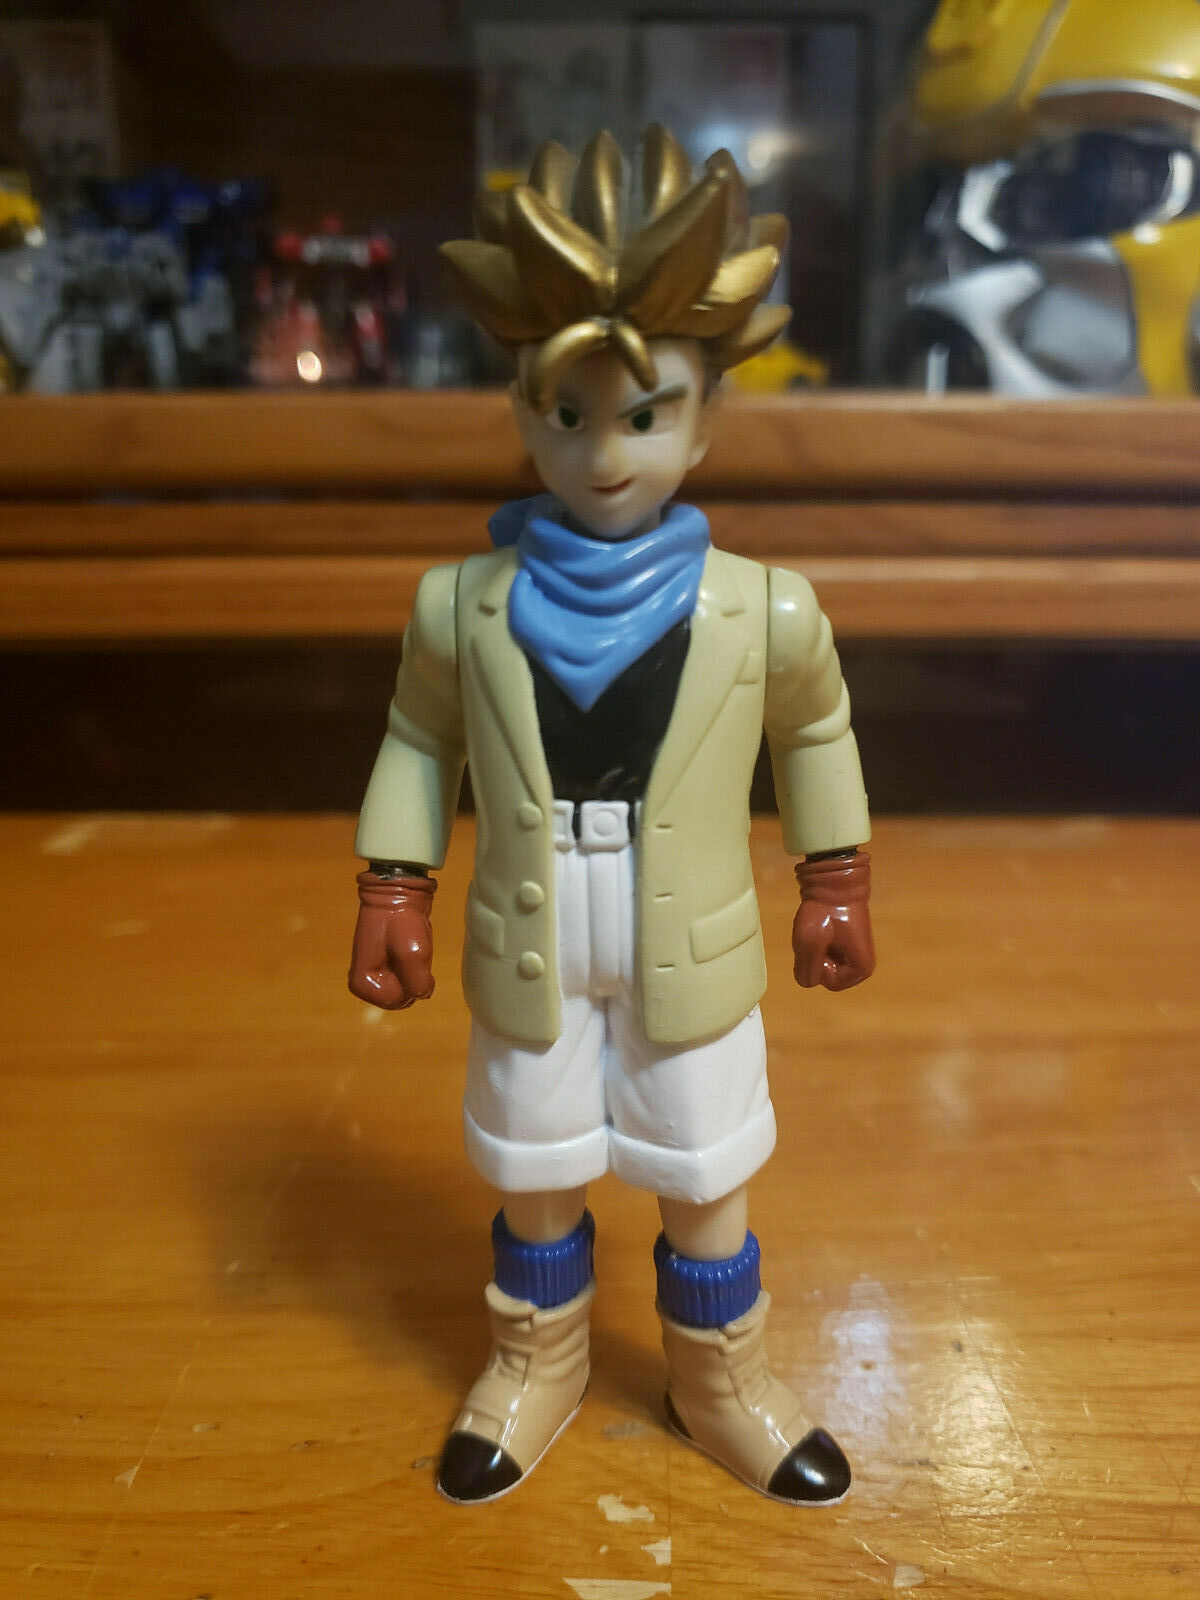 Character:GT Super Saiyan Trunks Vol 31:BANDAI Dragonball Z  and Dragon Ball GT super battle collection AB Toys & Irwin